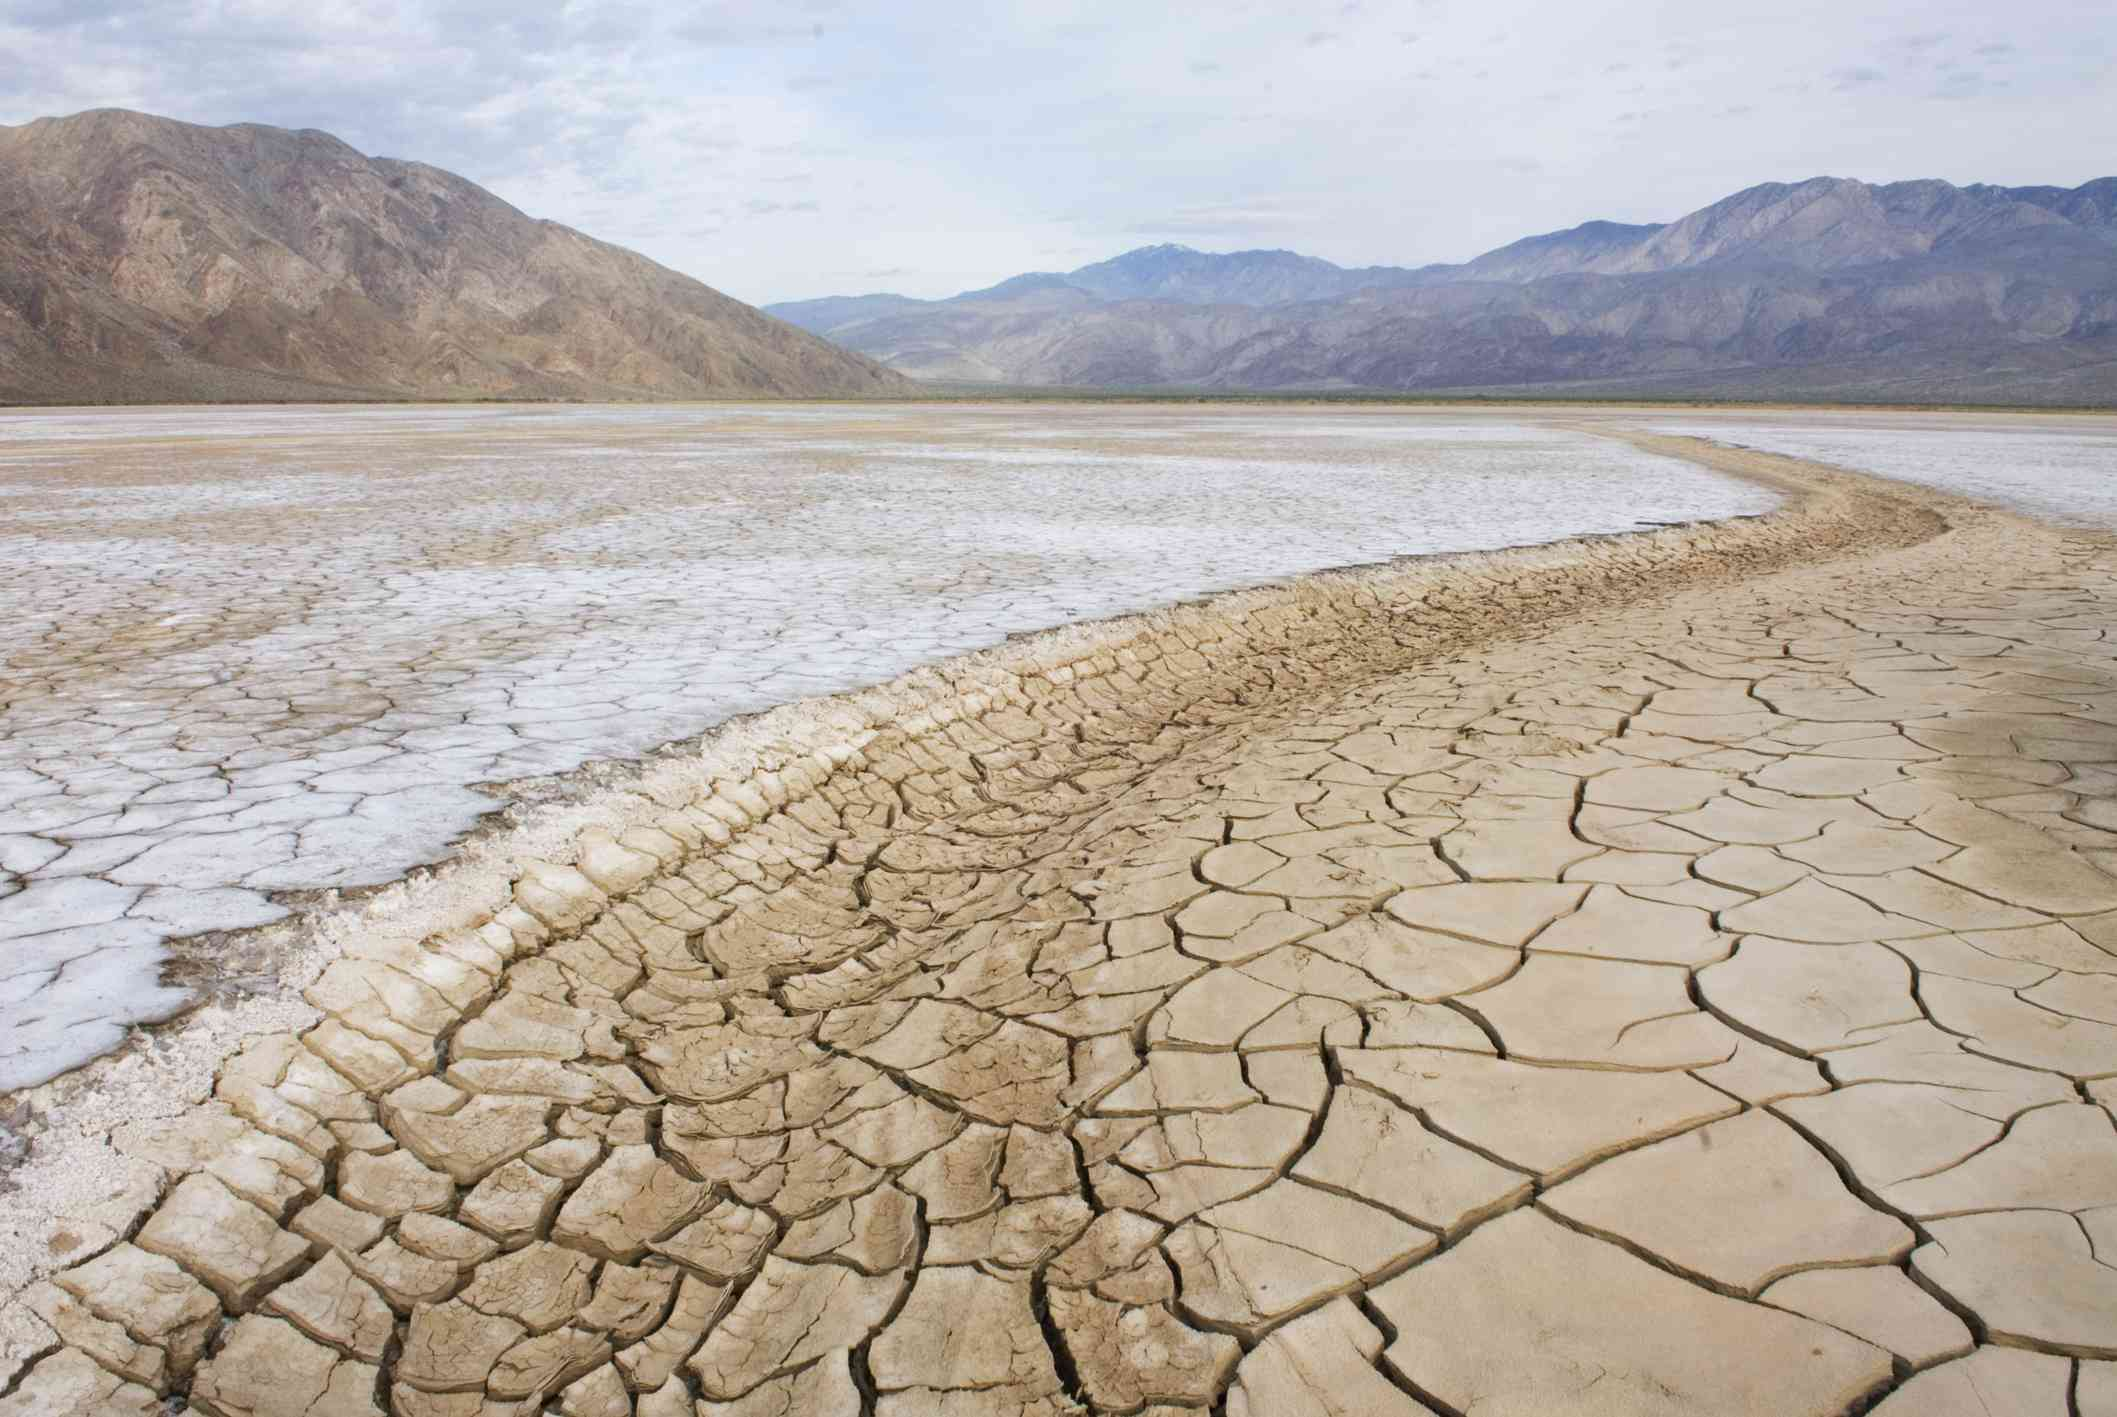 A desert floor, dry and cracked open. (Clark Dry Lake, Anza Borrego Desert State Park California, USA)